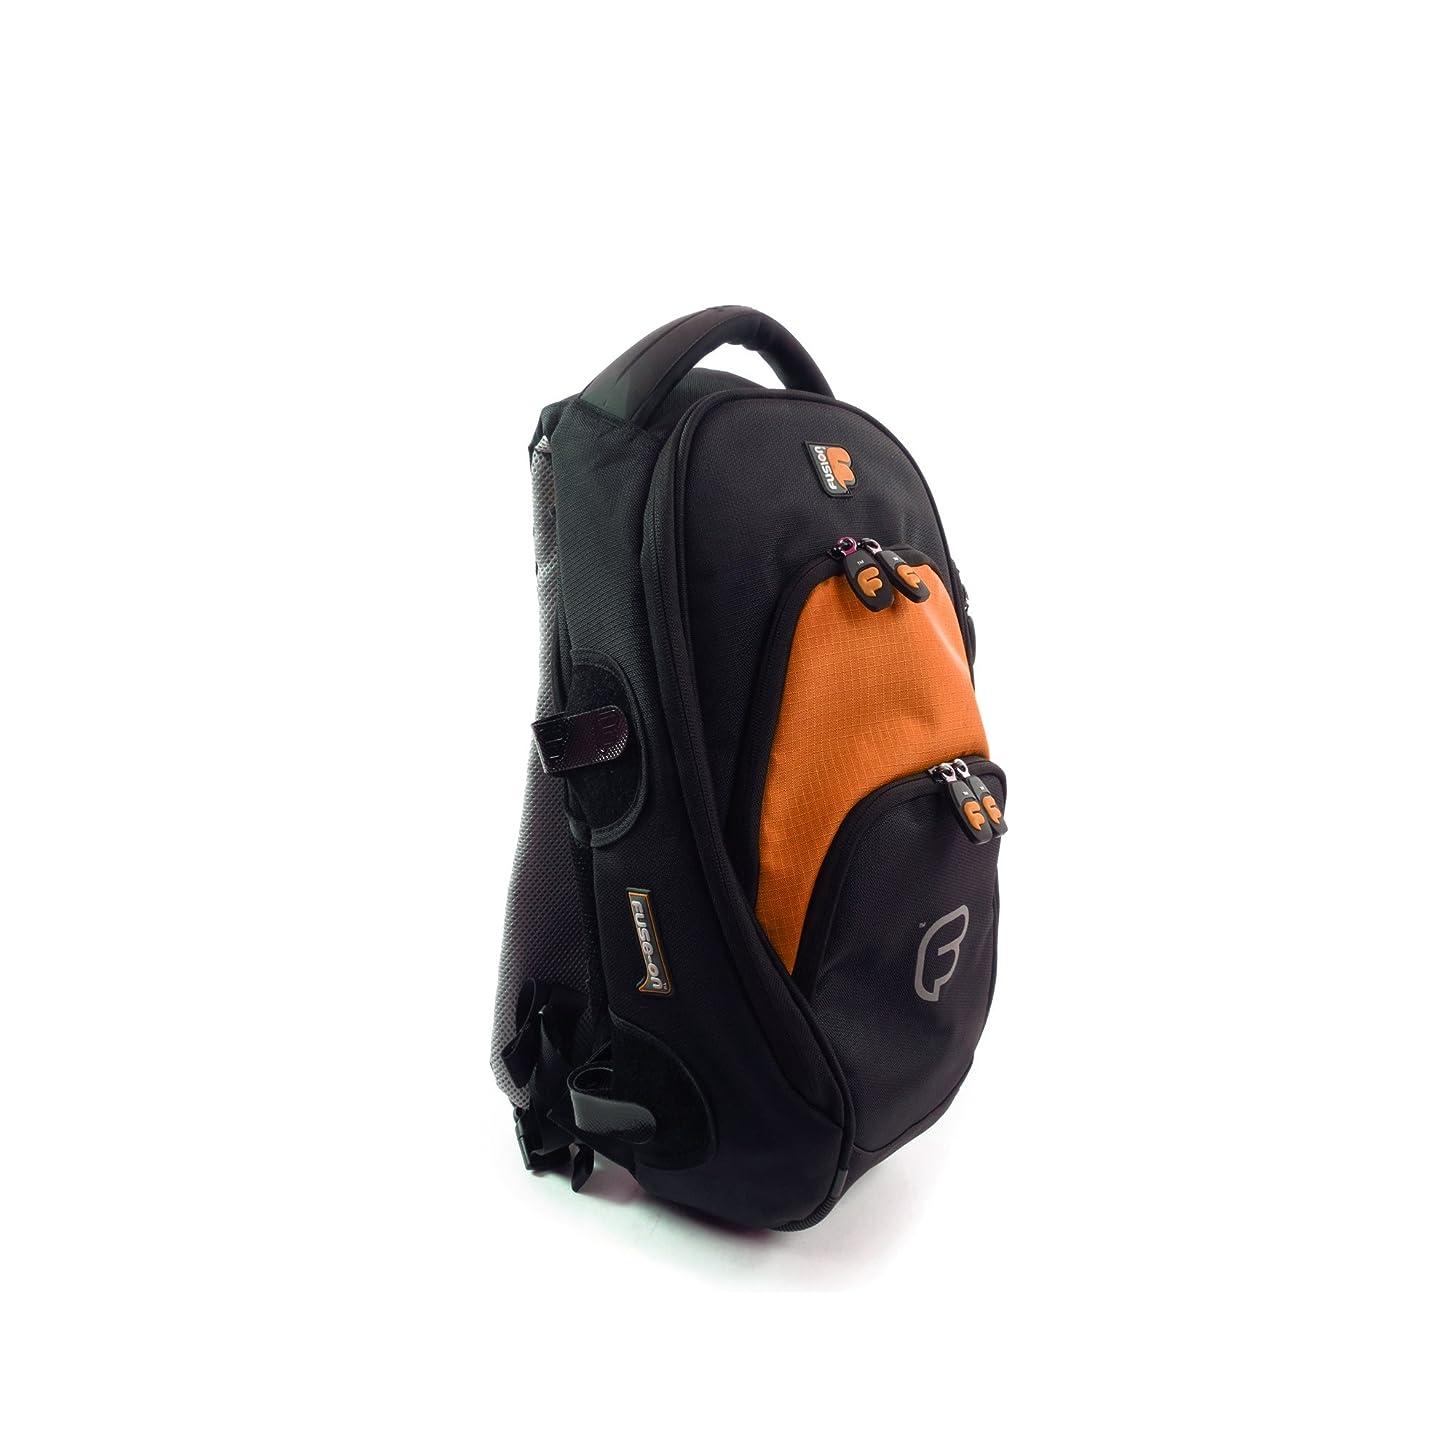 Fusion FB-PA-01-O Premium Series - Medium Backpack, Black/Orange